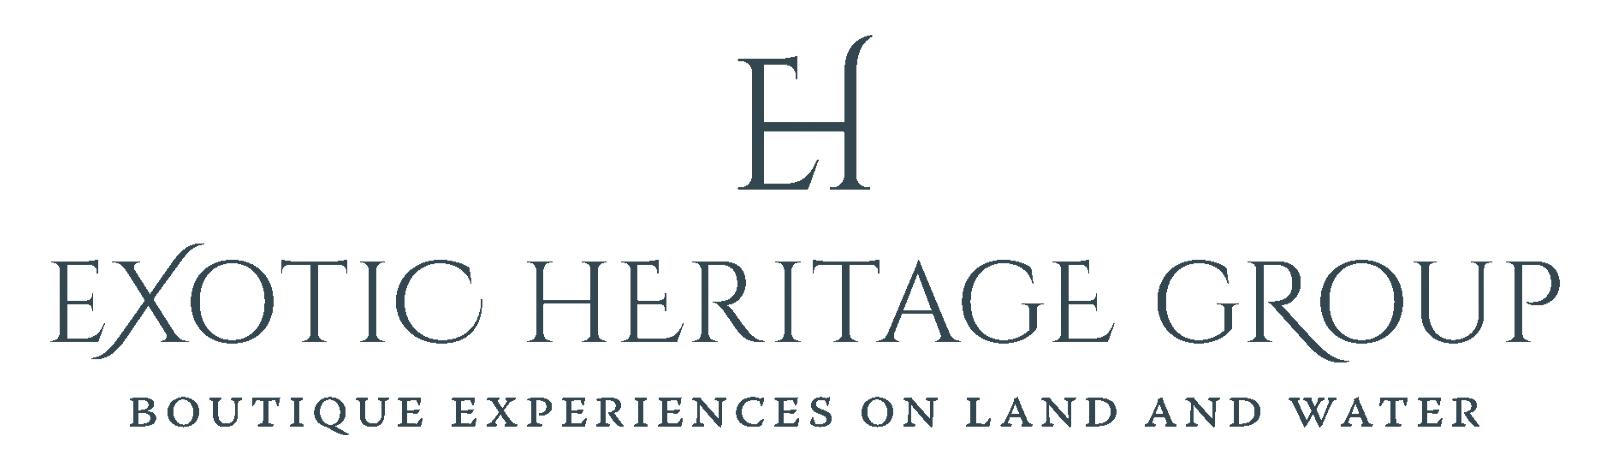 Hamilton-PR-Exotic-Heritage-Group.jpg